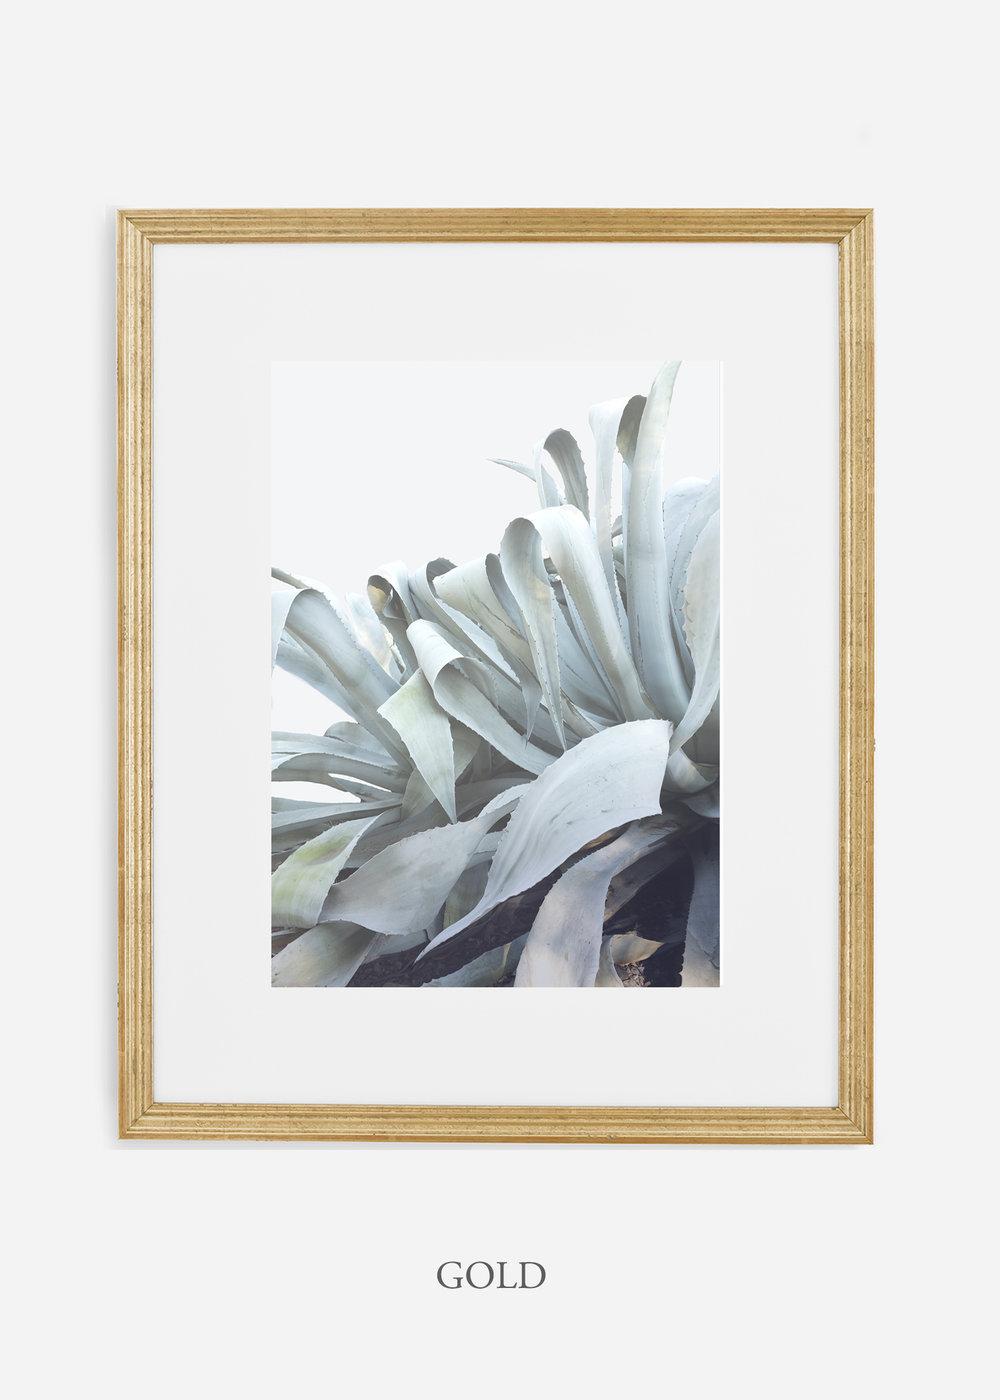 wildercalifornia_goldframe_WinterWhite_AgaveNo.2_Desert_LosAngeles_Art_HomeDecor_interiordesign_design.jpg